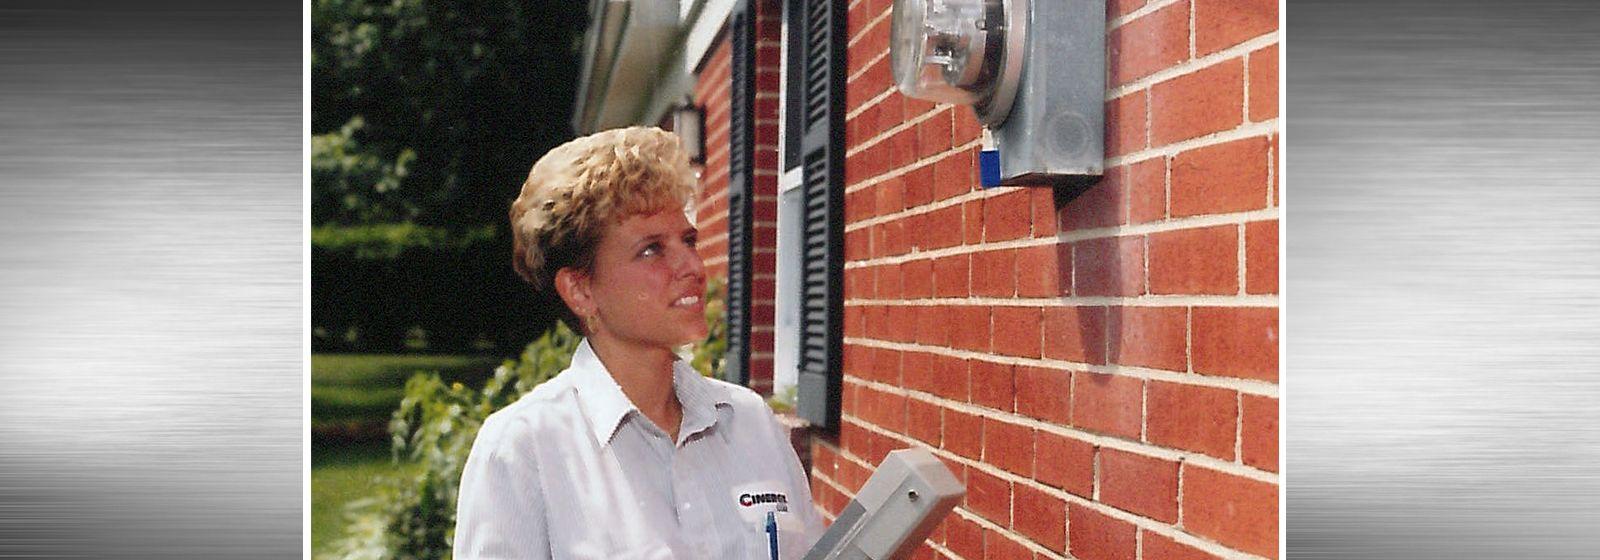 Retro photos: Minding the meter